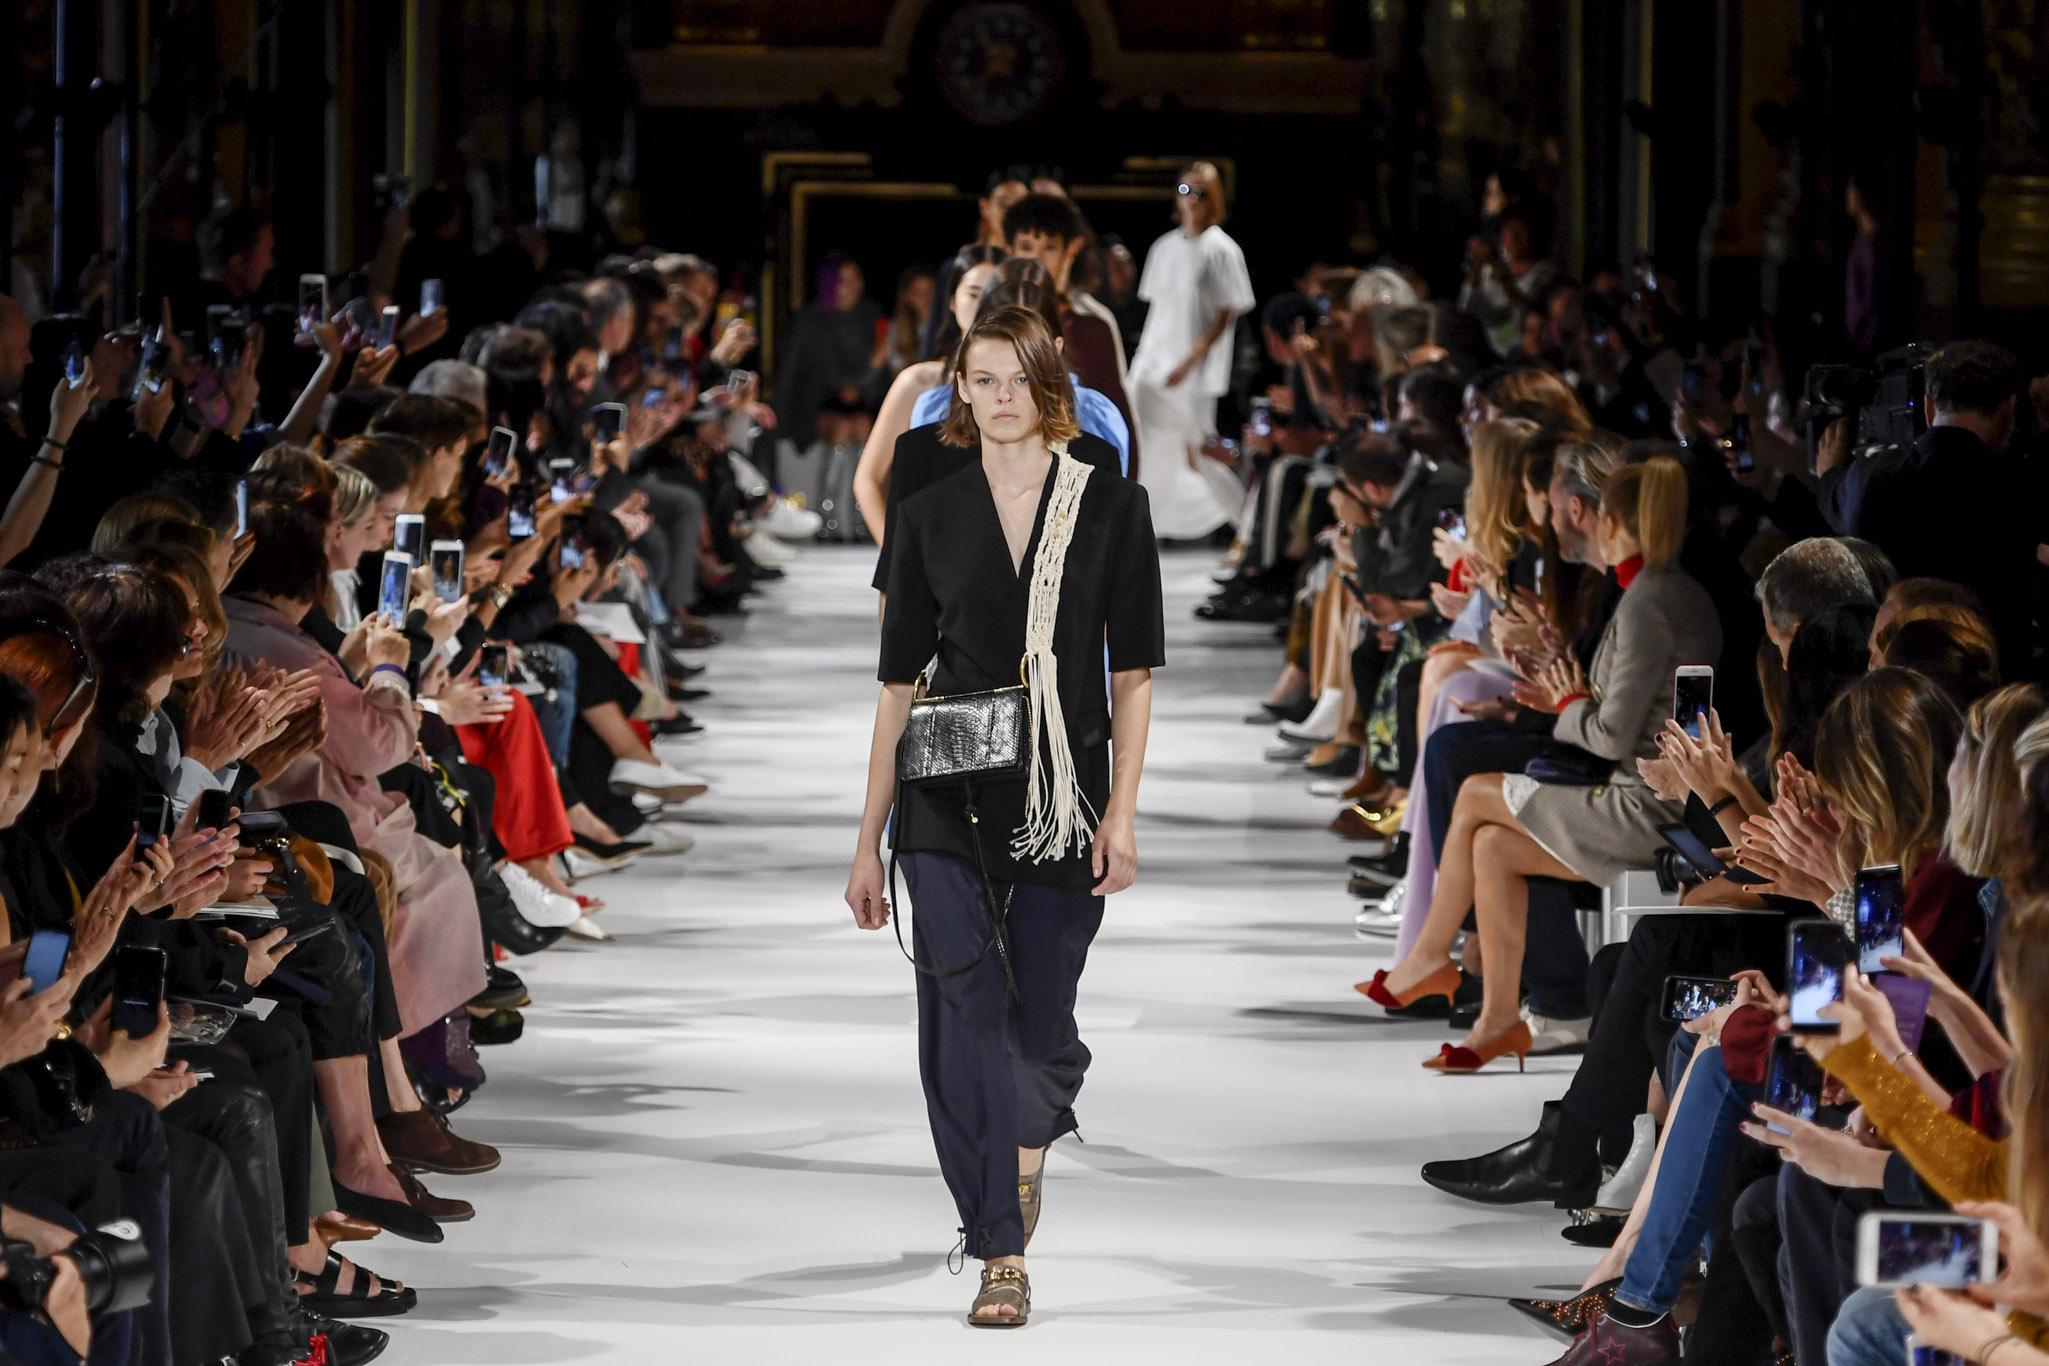 stella-mccartney-d-rtw-spring-summer-2018-paris-fashion-week-5520.jpg